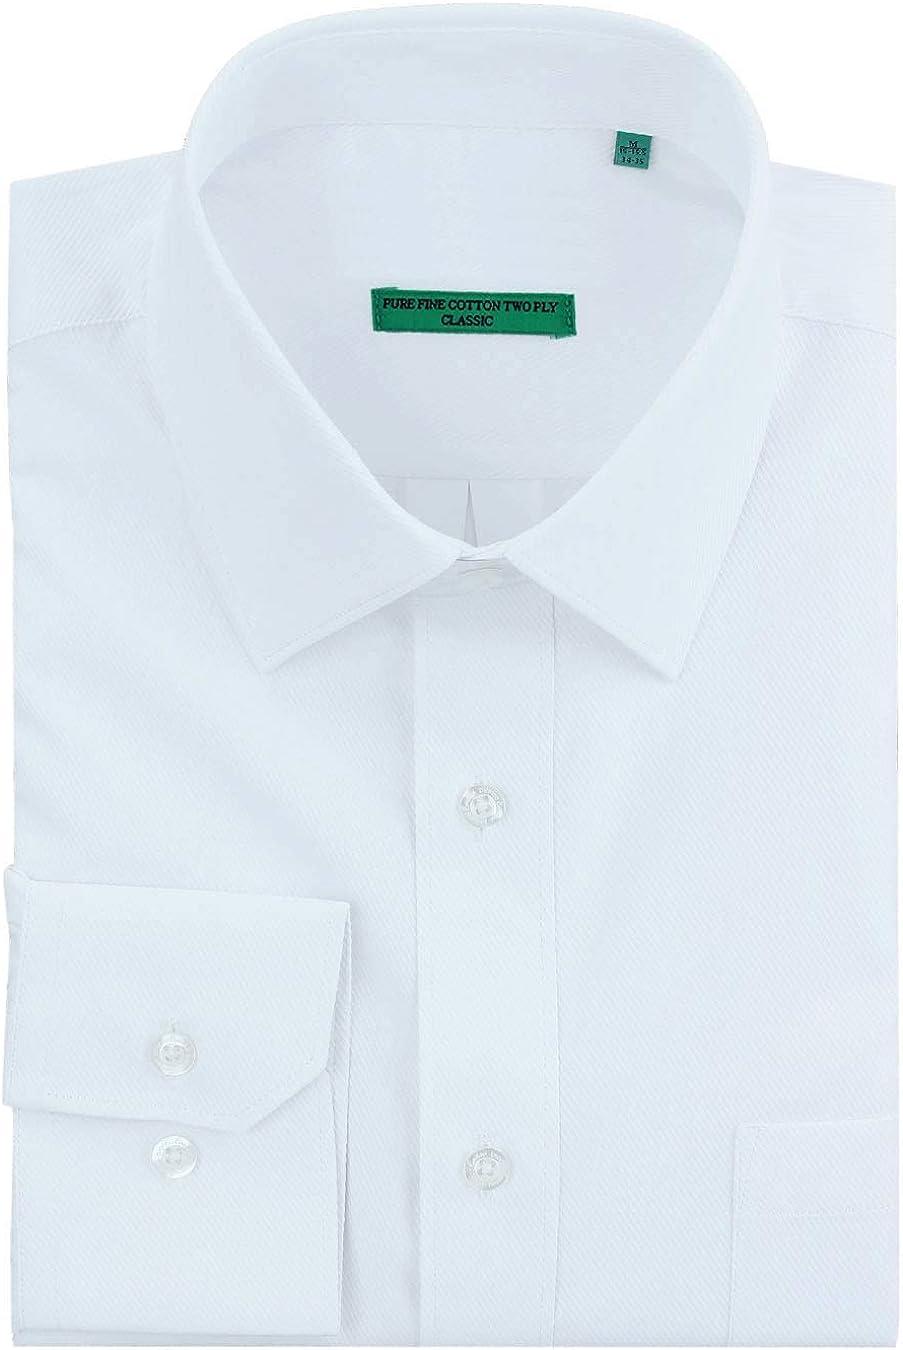 DTI BB Signature Men's Classic Fit Pure Cotton Tone On Tone Stripe Dress Shirt